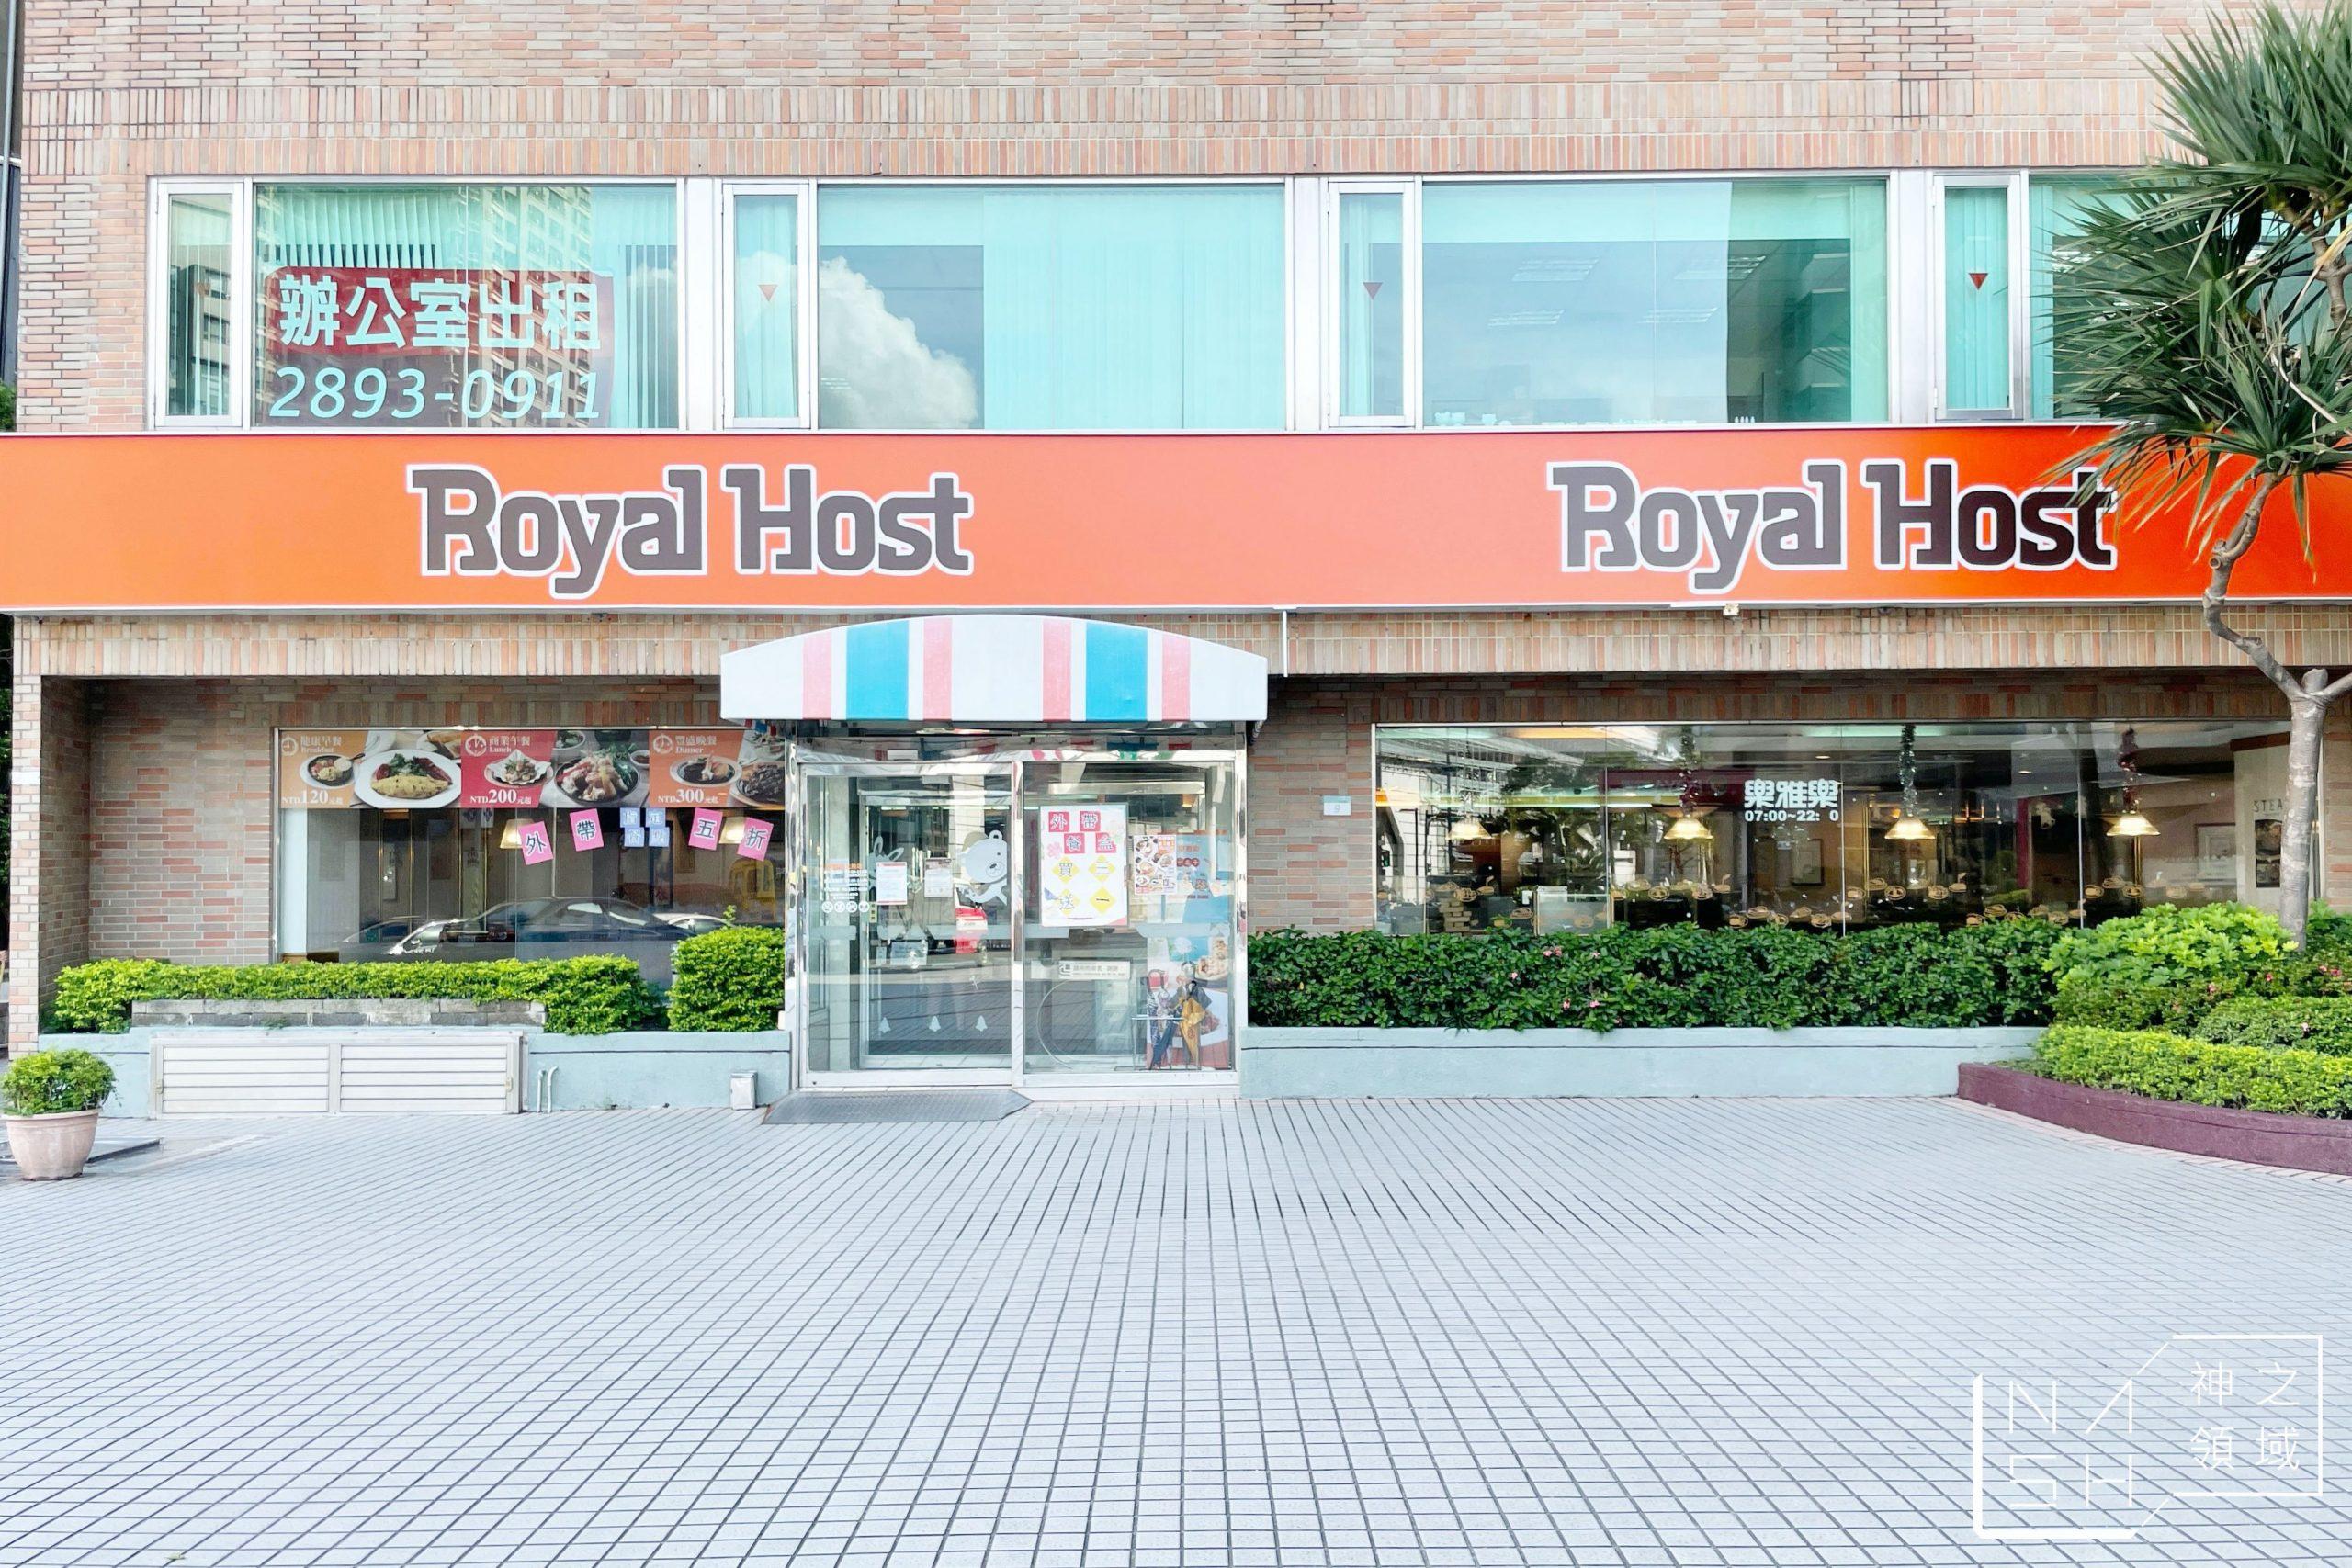 Royal Host 樂雅樂餐廳,樂雅樂餐廳,樂雅樂餐廳套餐,樂雅樂餐廳防疫套餐